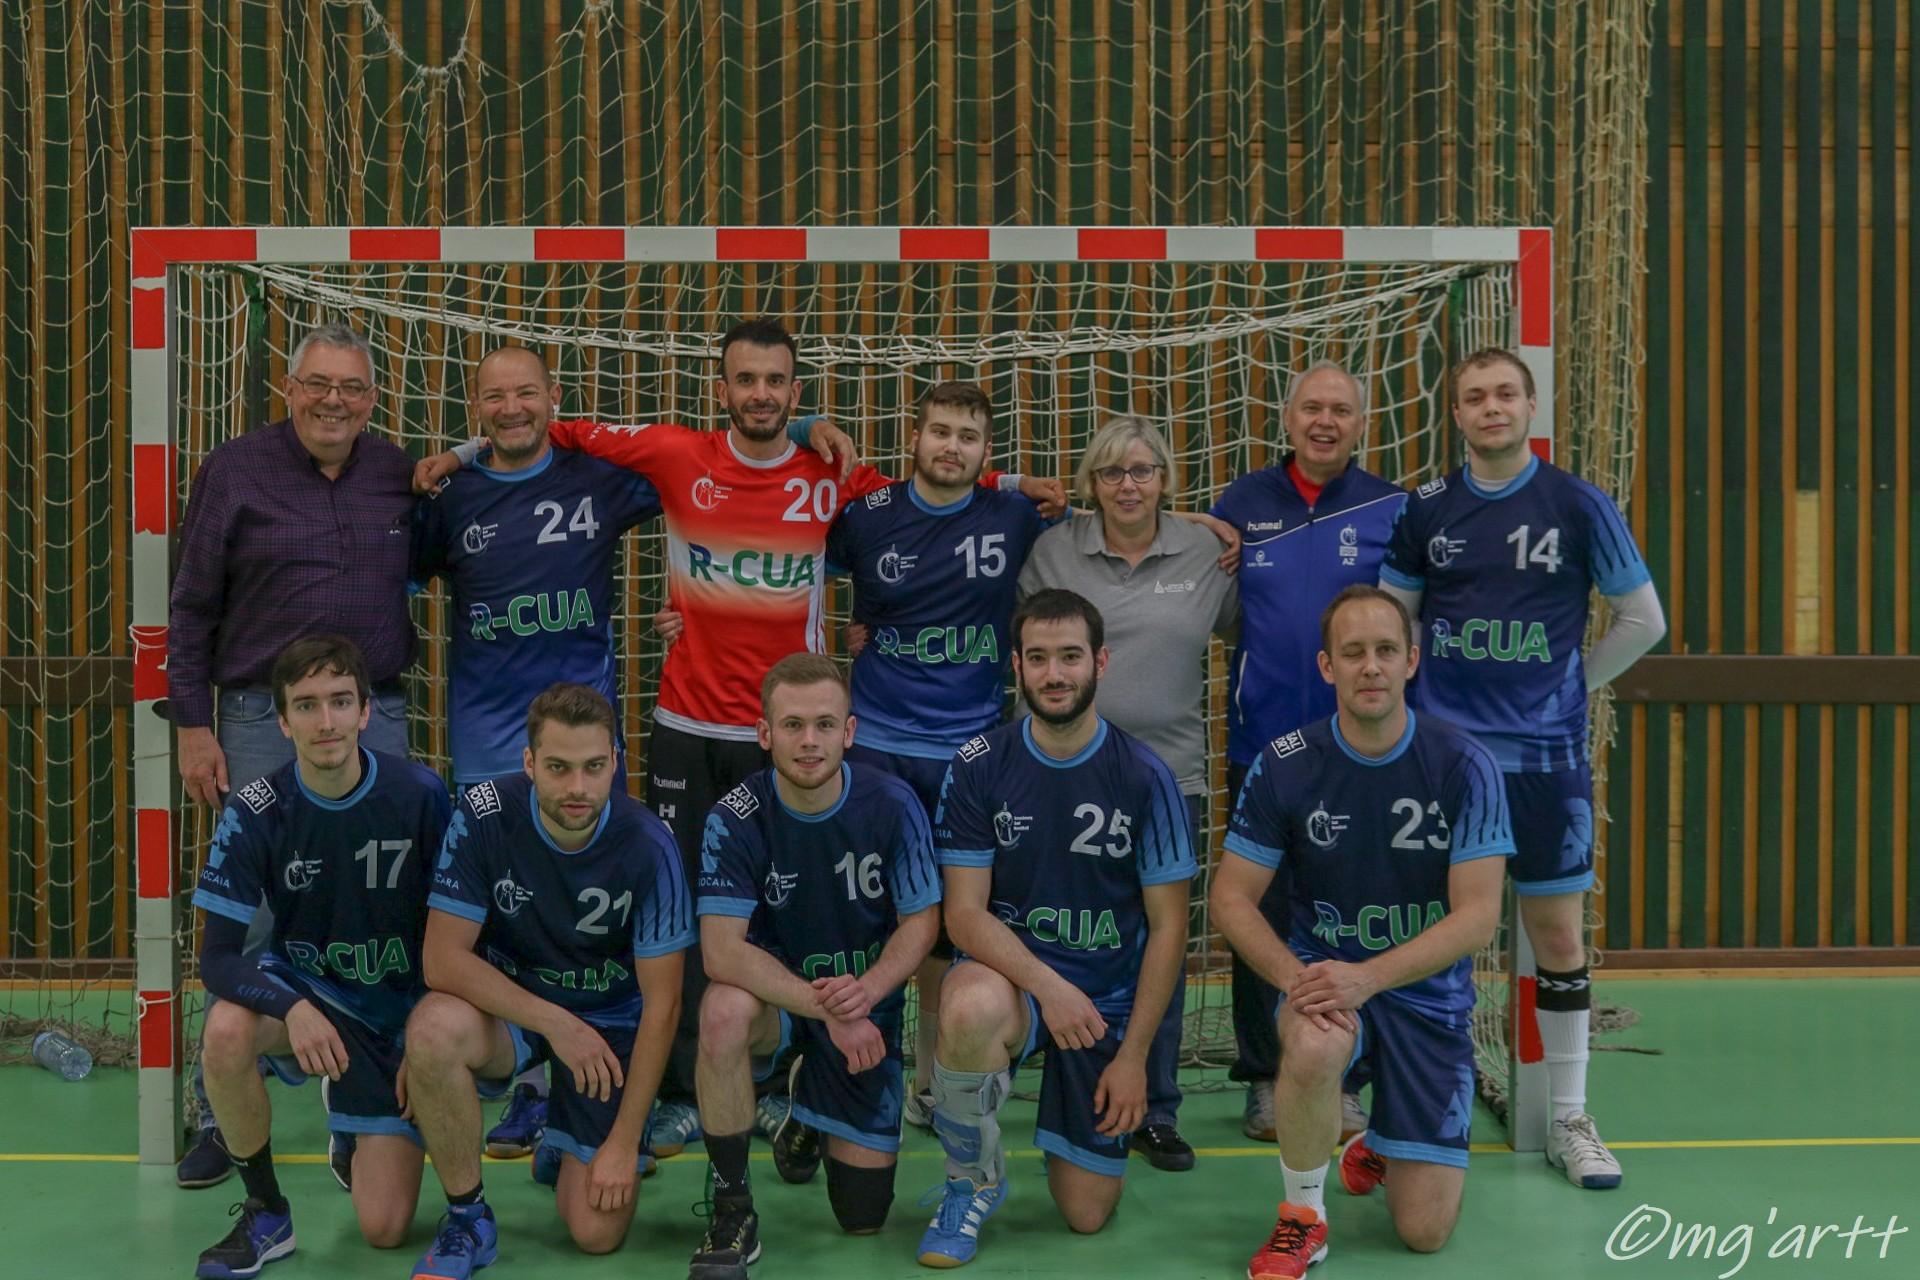 équipe sénior masculins 2 du SSHB